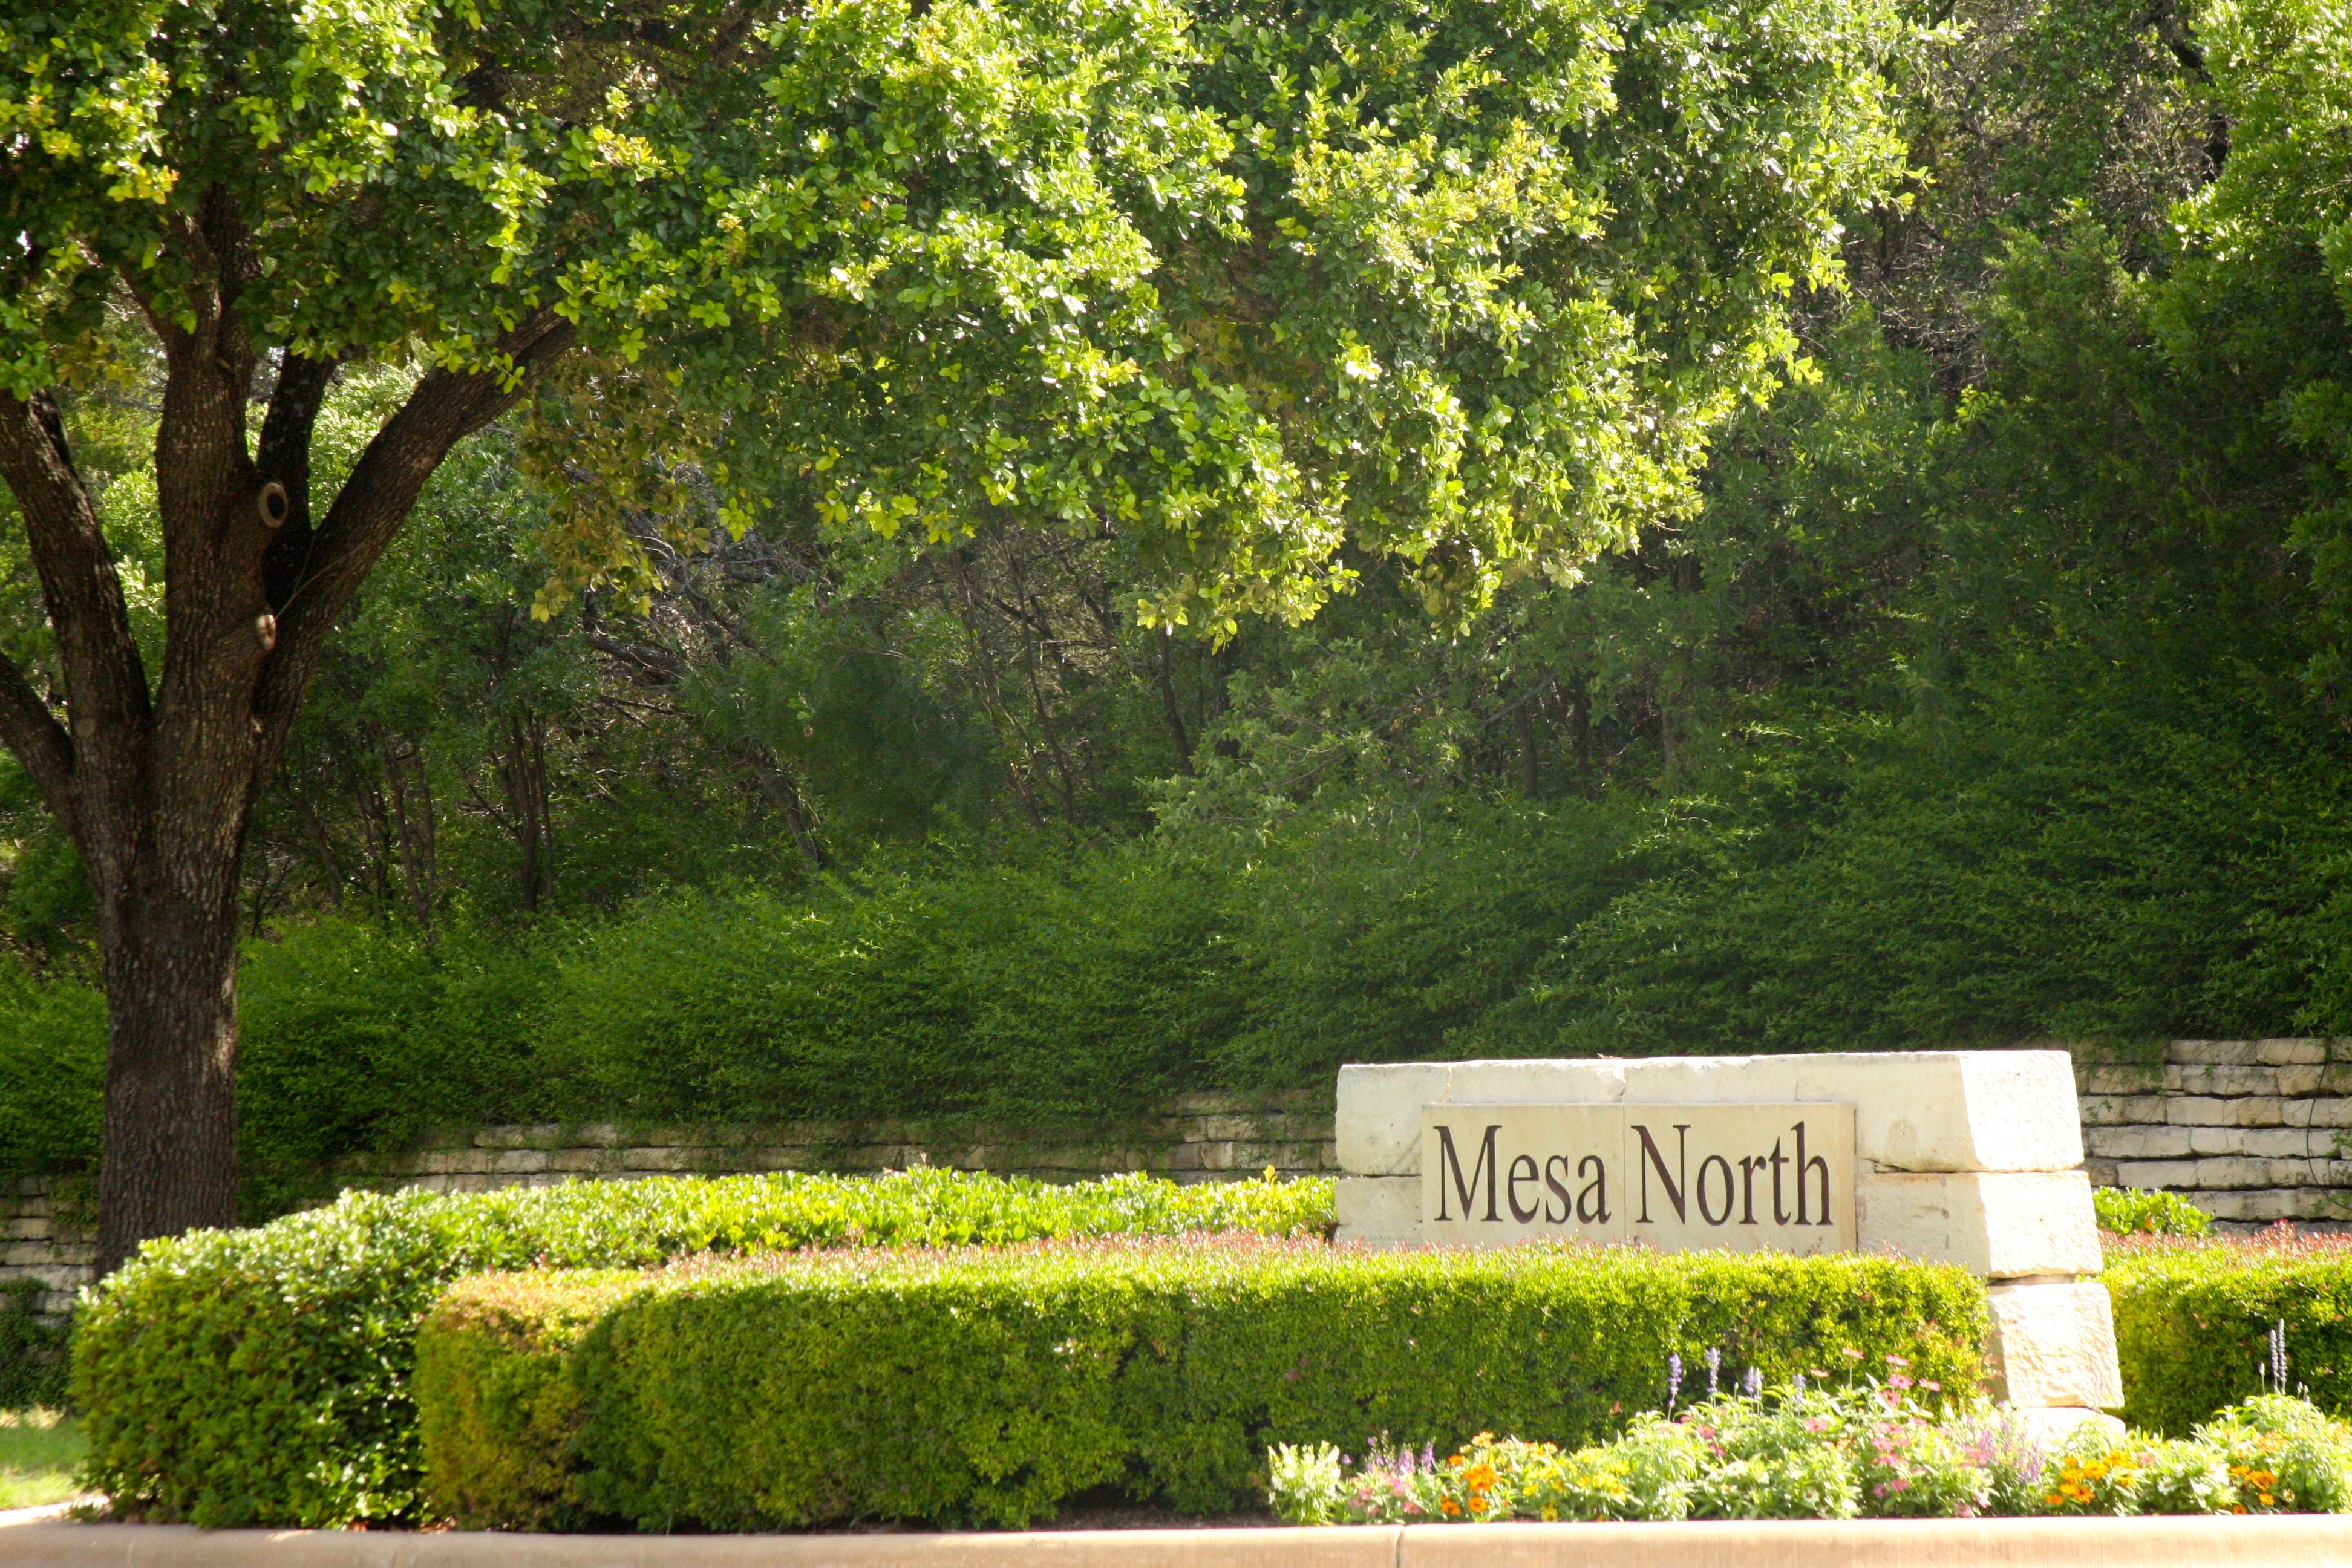 Homes for sale Mesa North Steiner Ranch, Austin Texas Real Estate, Gene Arant Team